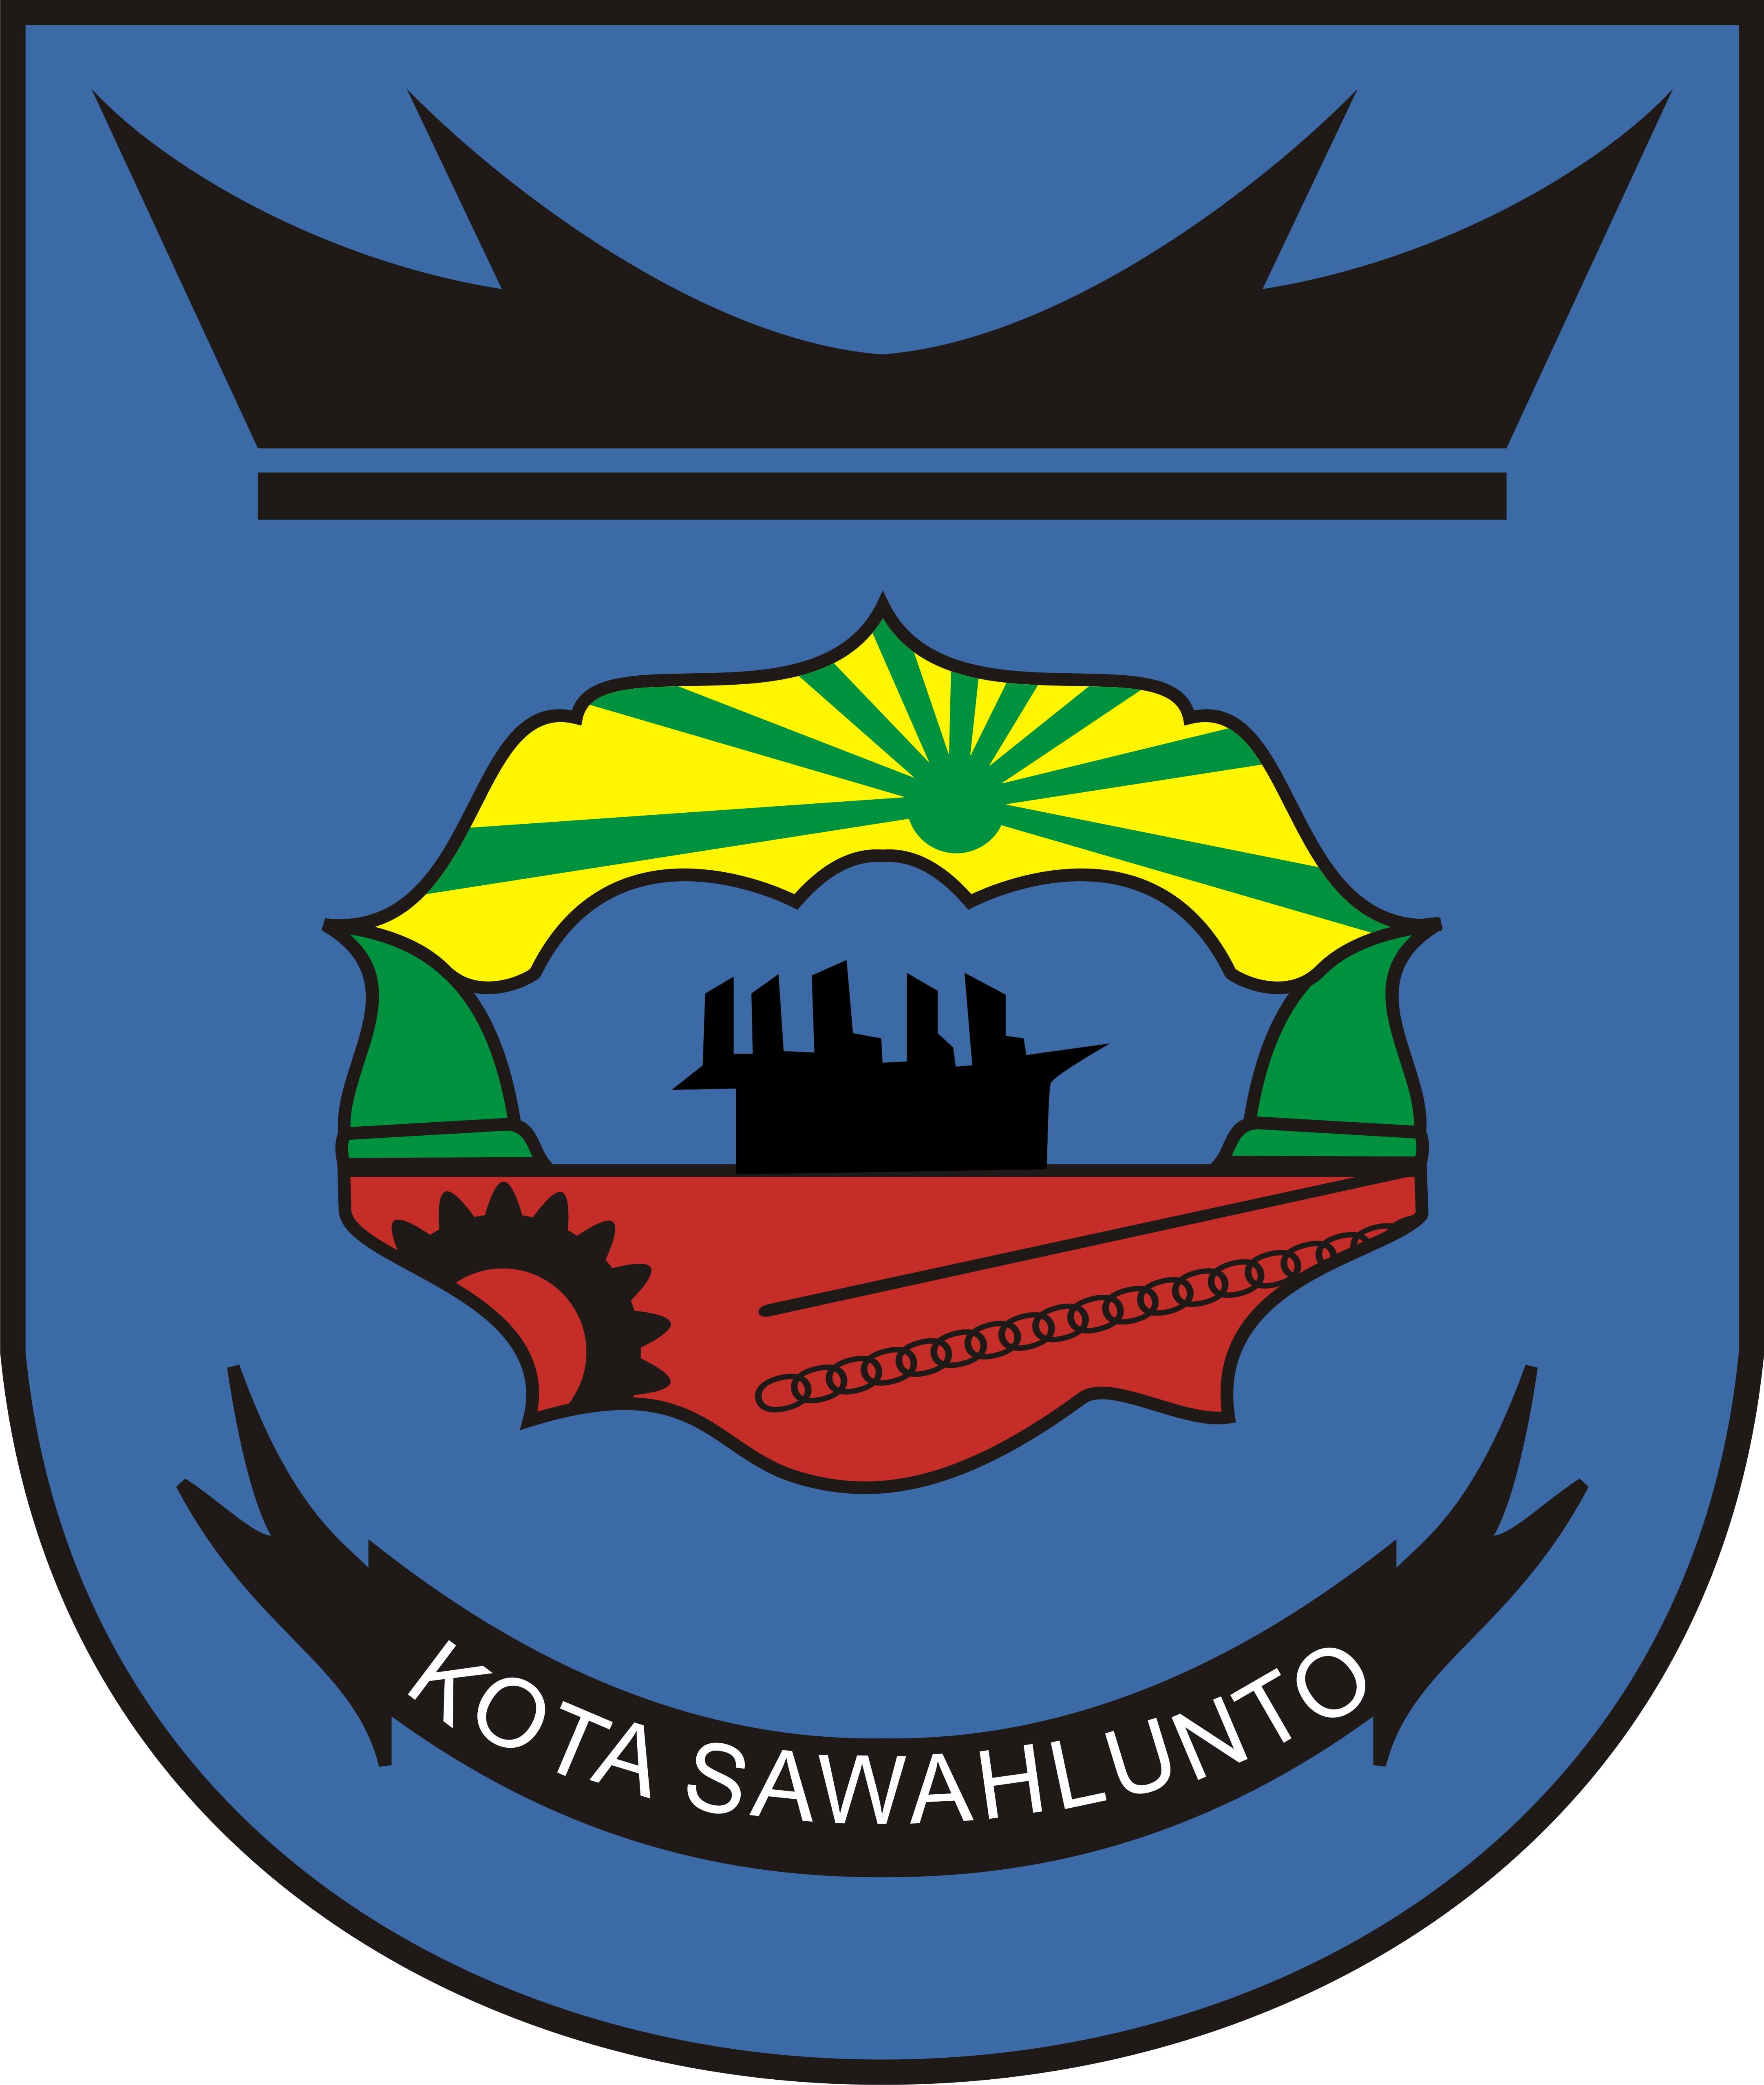 Berkas Lambang Kota Sawahlunto Jpg Wikipedia Bahasa Indonesia Ensiklopedia Bebas